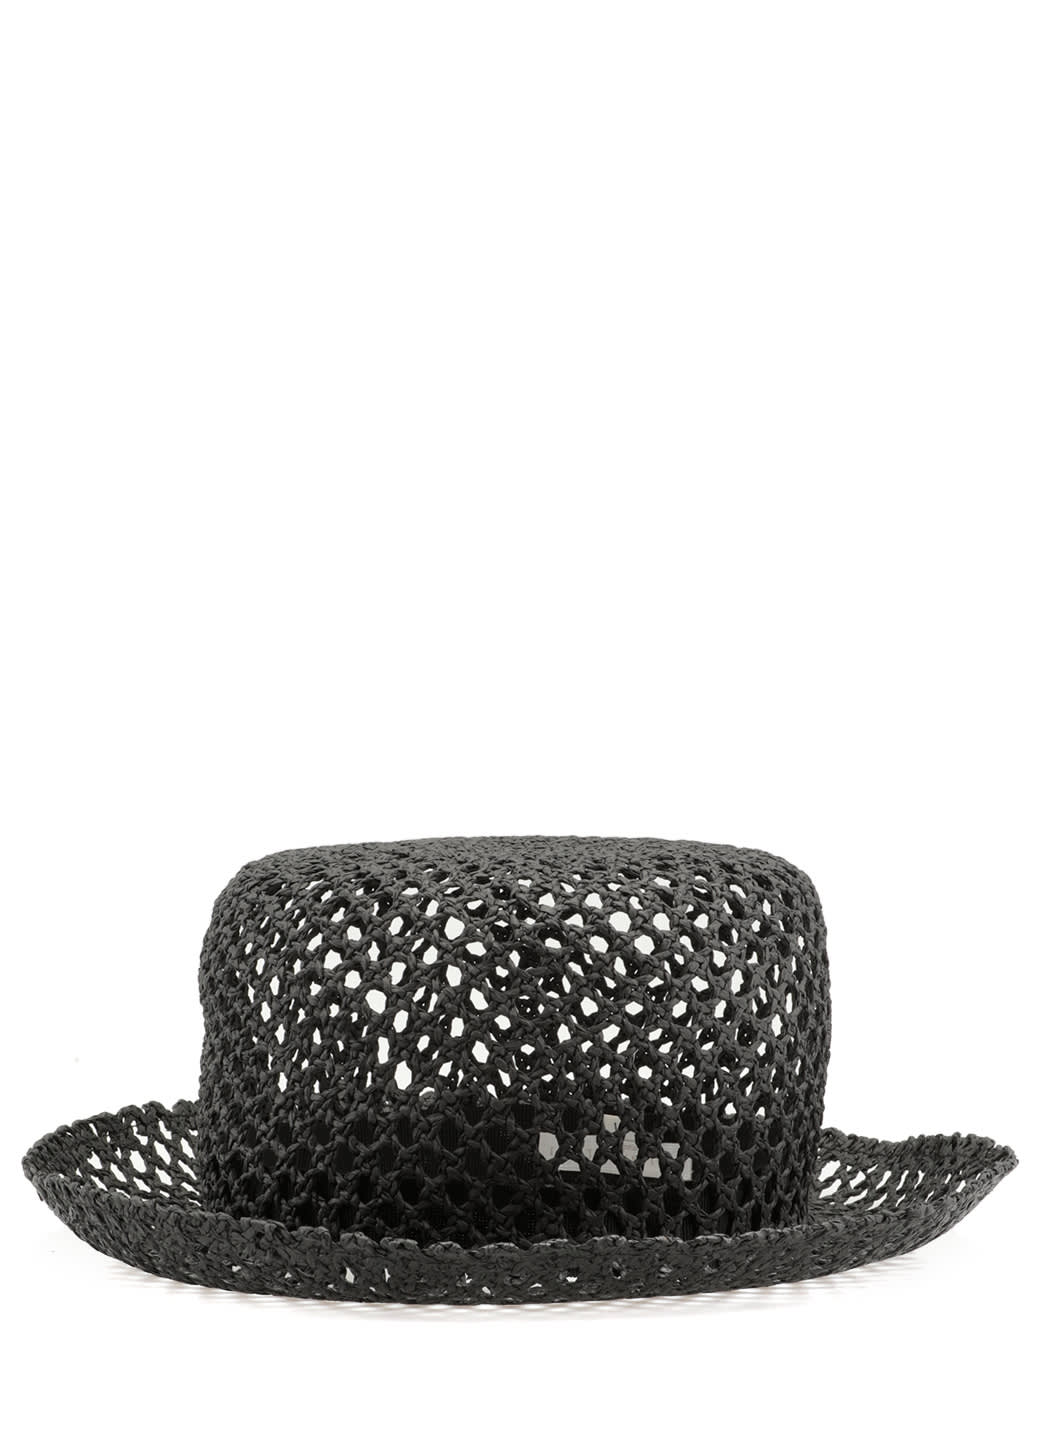 Fabiana Filippi Woven Straw Hat